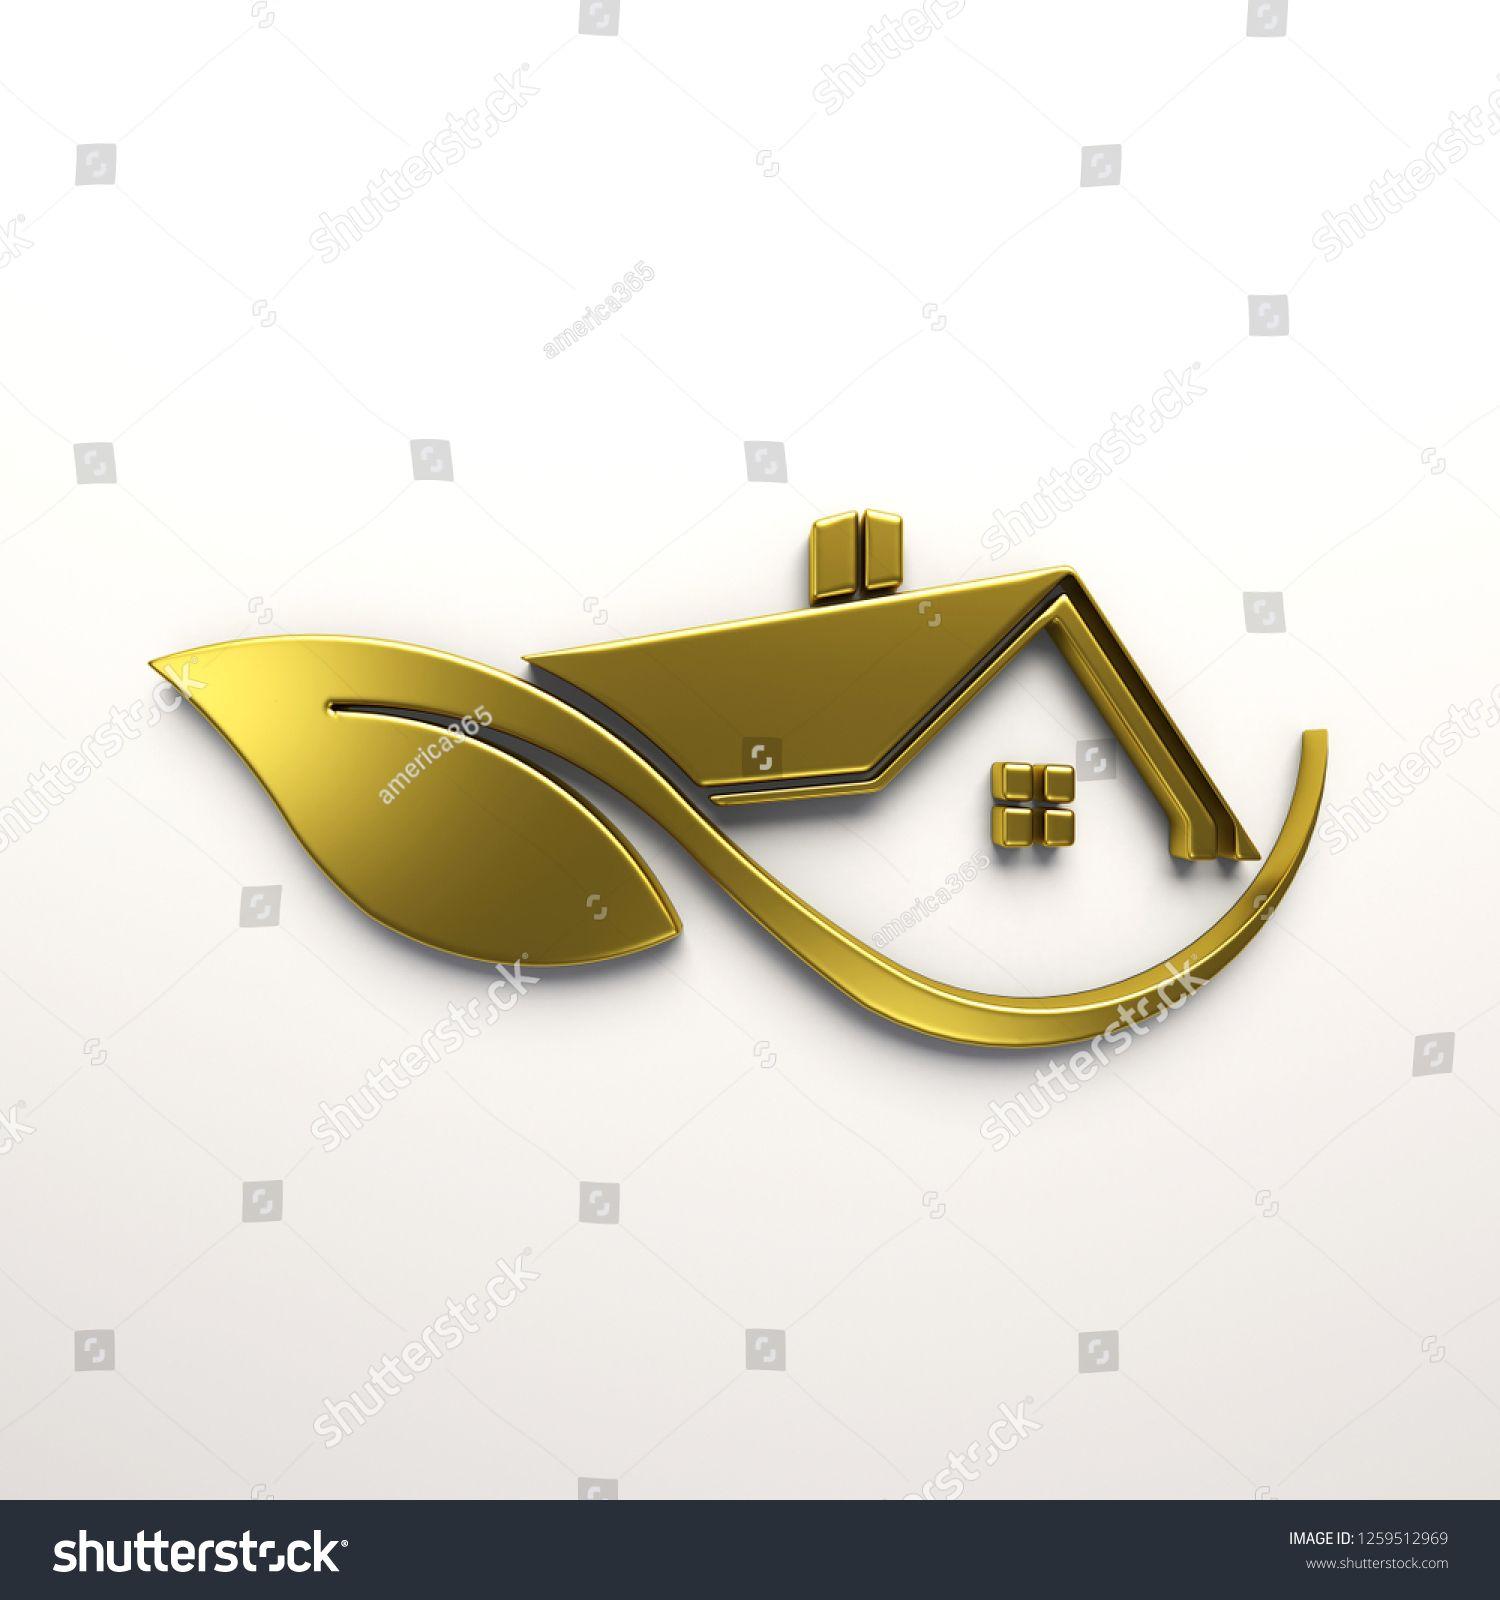 Home Design 3d Gold: Eco Friendly Gold House Logo 3d Stock Illustration